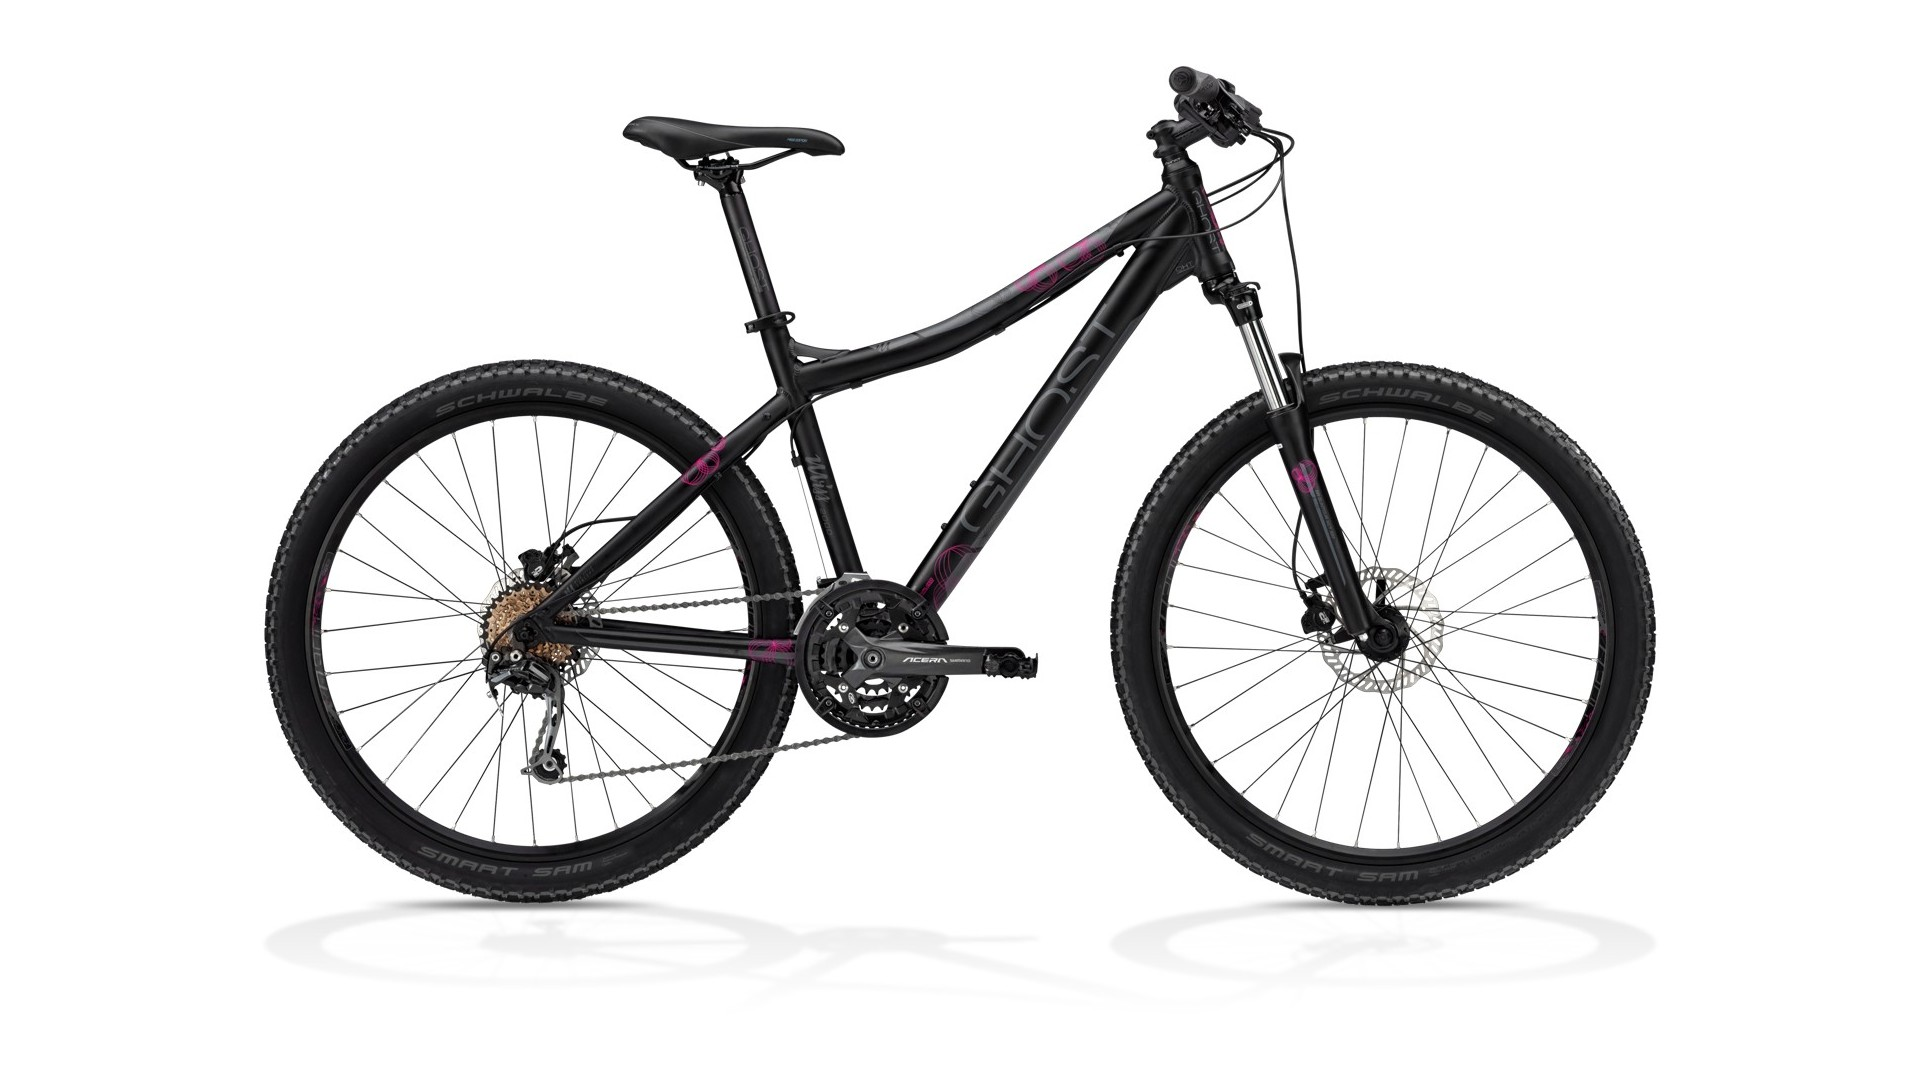 Велосипед GHOST MISS 2000 black/grey/pink год 2013